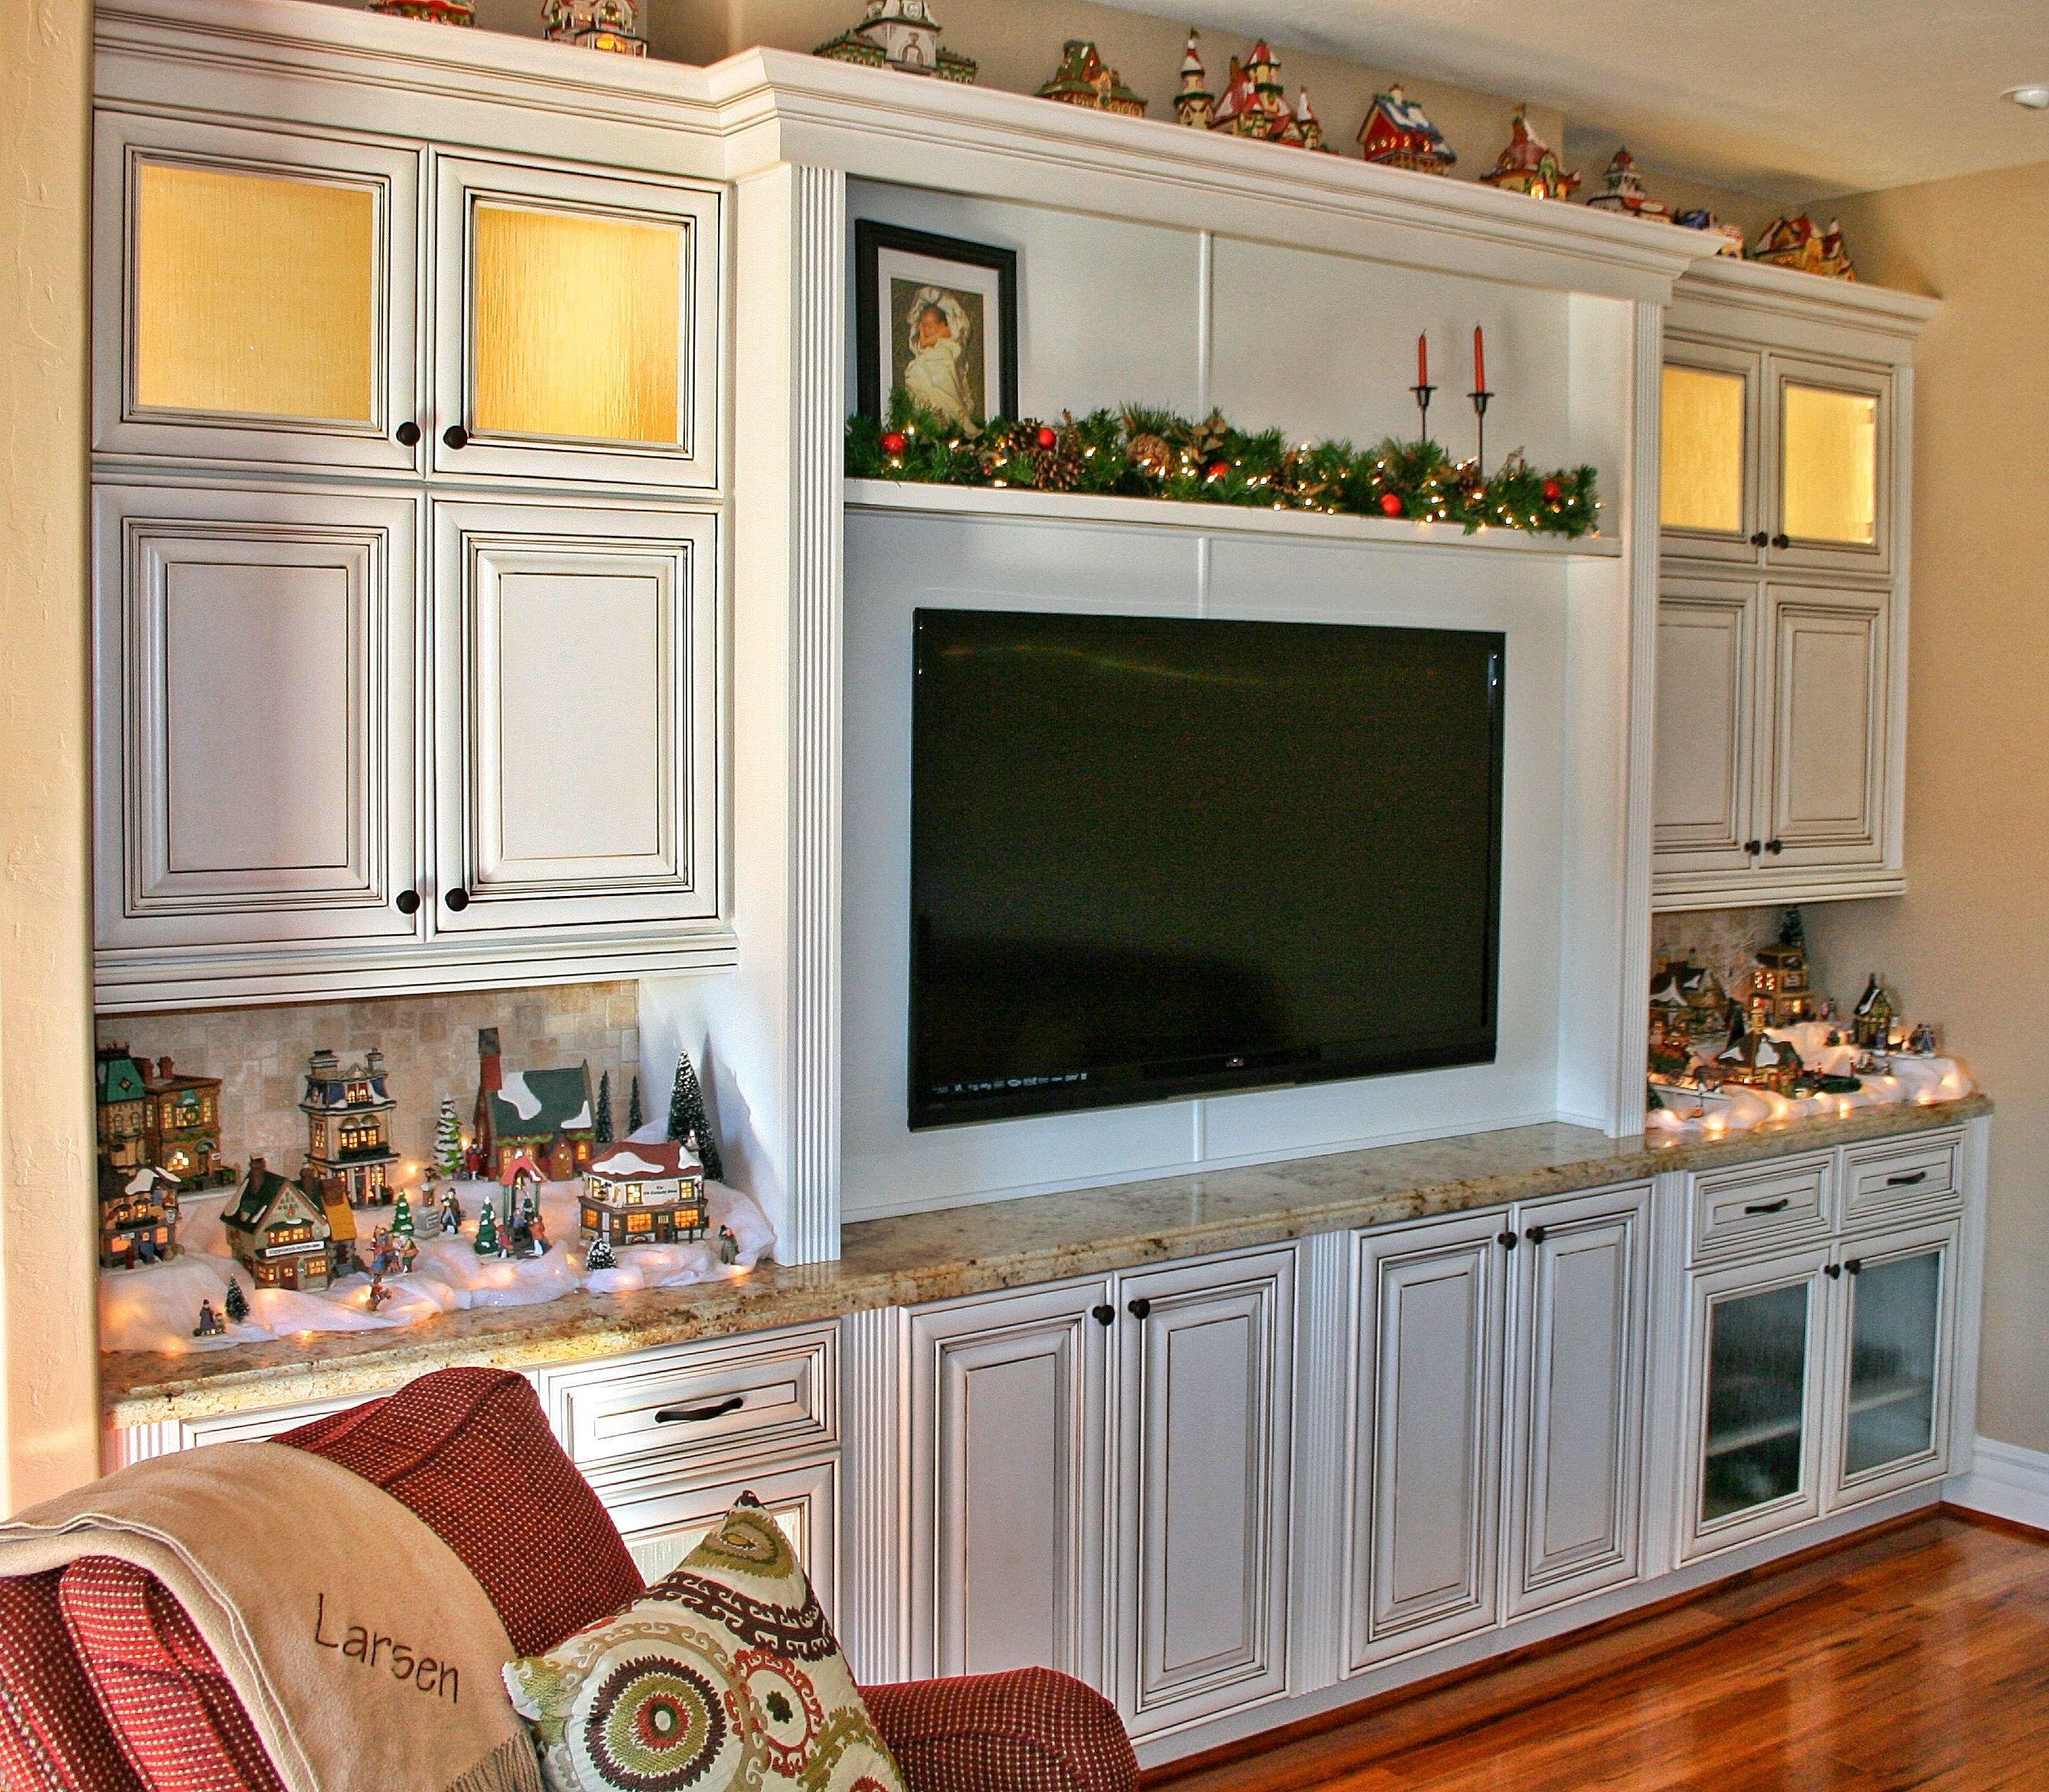 Hunt S Kitchen Design Cherry Wood Kitchens Wood Kitchen Cabinets Cherry Wood Kitchen Cabinets